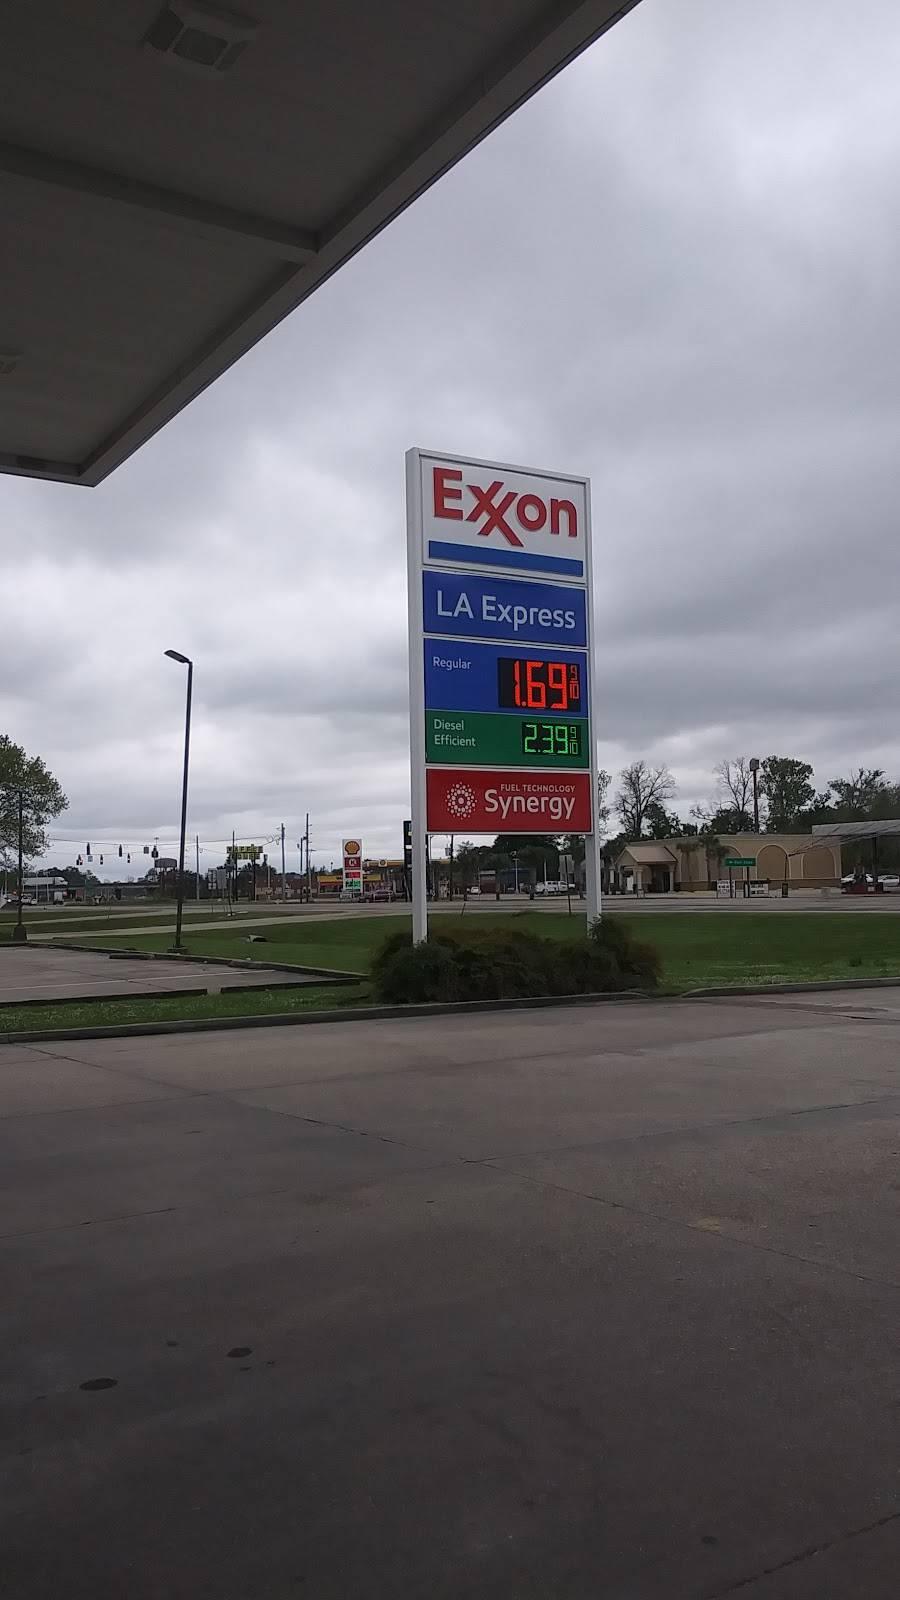 LA EXPRESS FOOD STORE #9 - gas station  | Photo 2 of 3 | Address: 222 LA-415, Port Allen, LA 70767, USA | Phone: (225) 343-9976